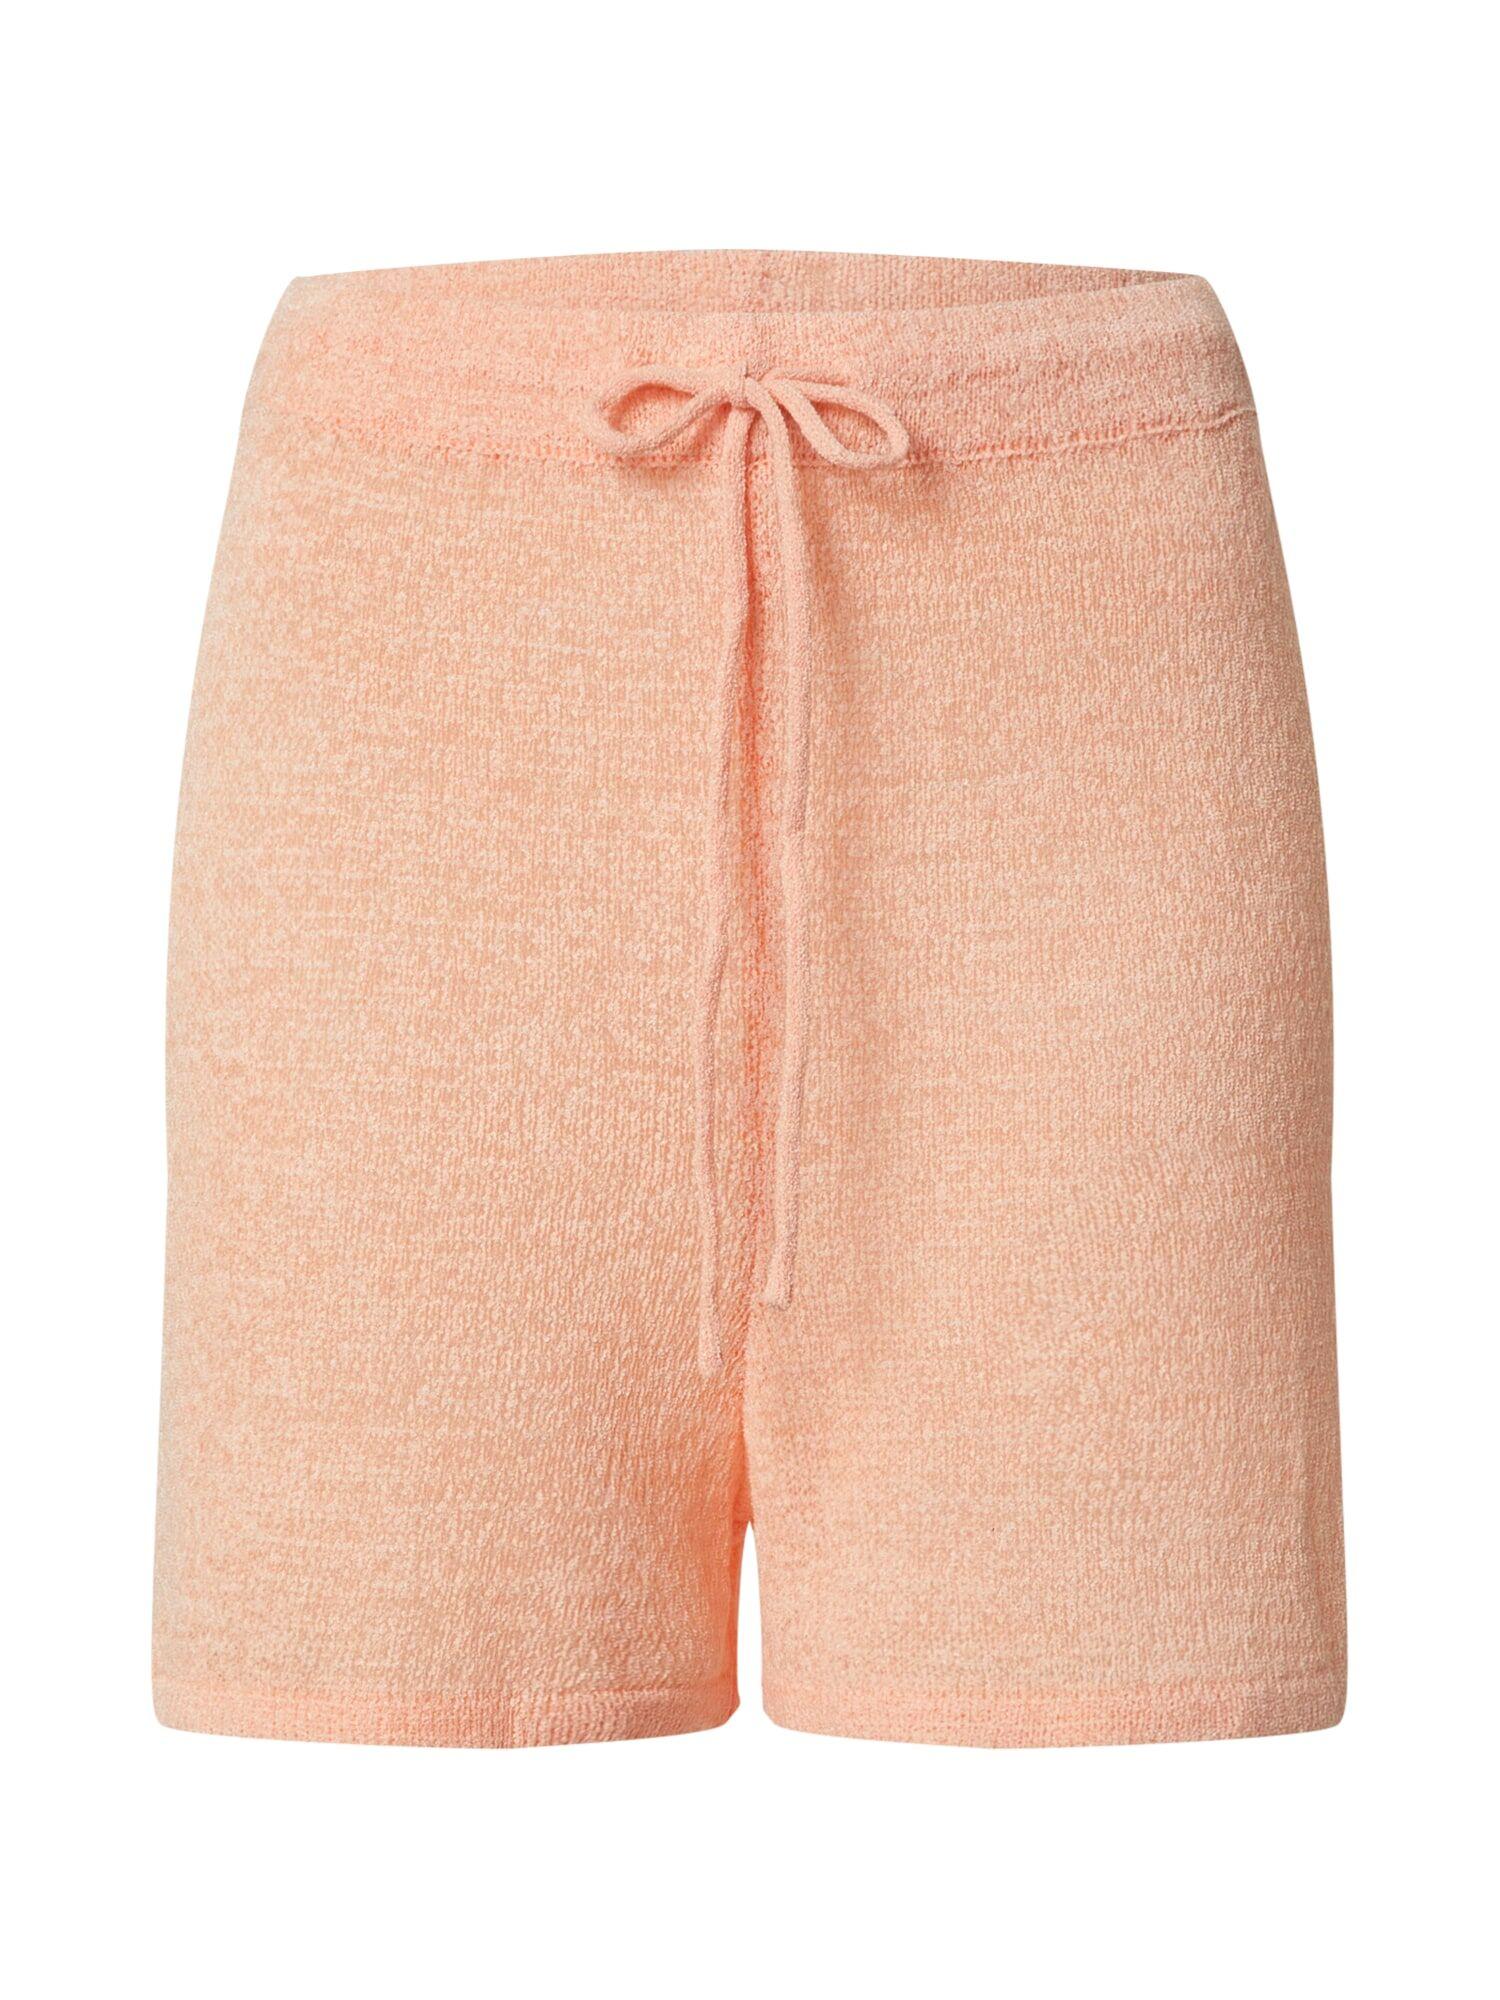 cotton on pantaloni 'the match me' arancione